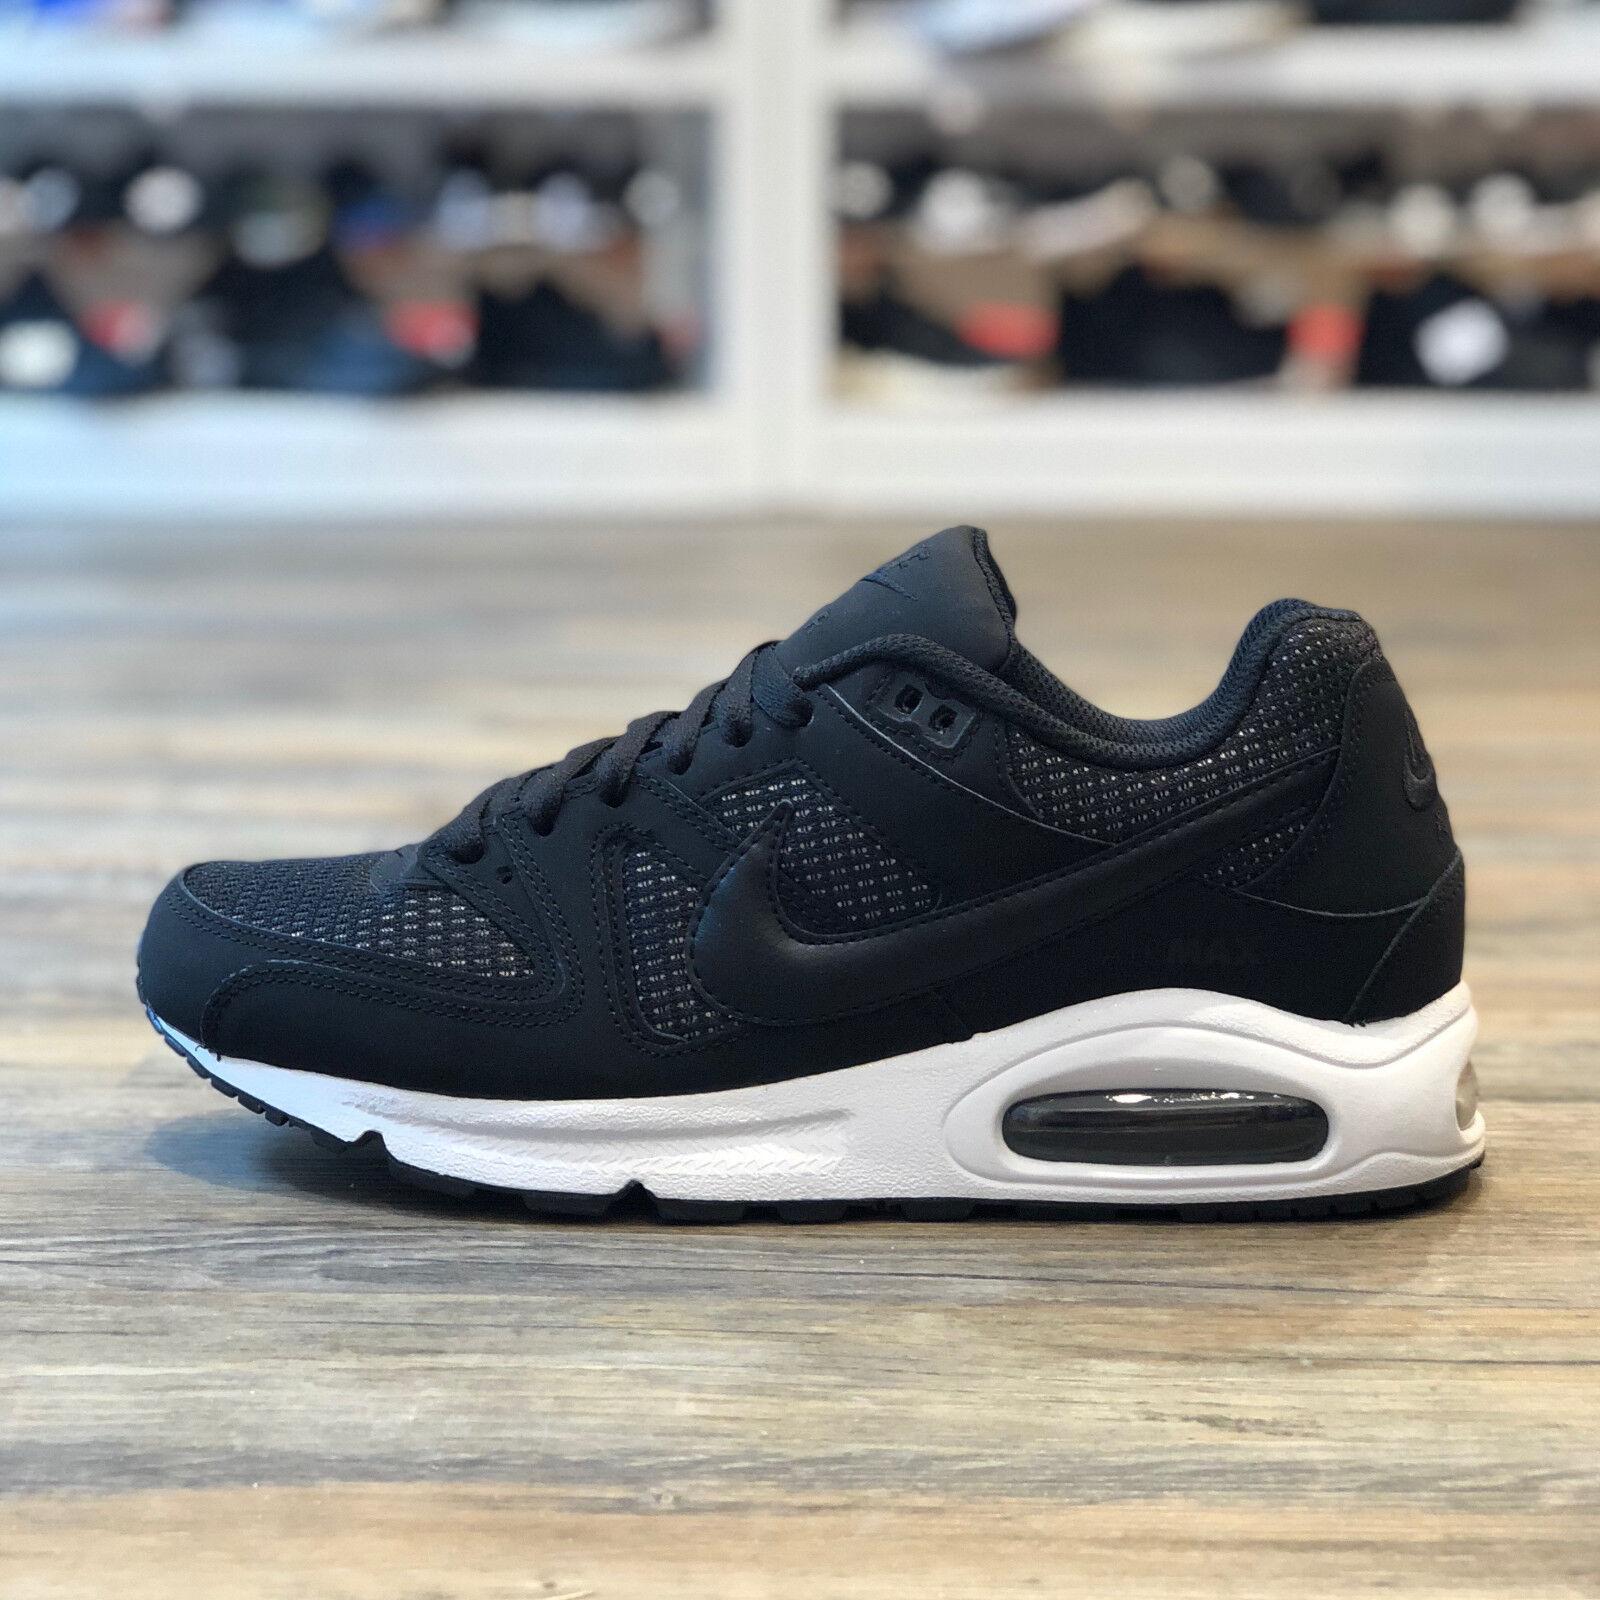 Nike Air Max Command Gr.43 Schuhe Sneaker schwarz weiß shoes